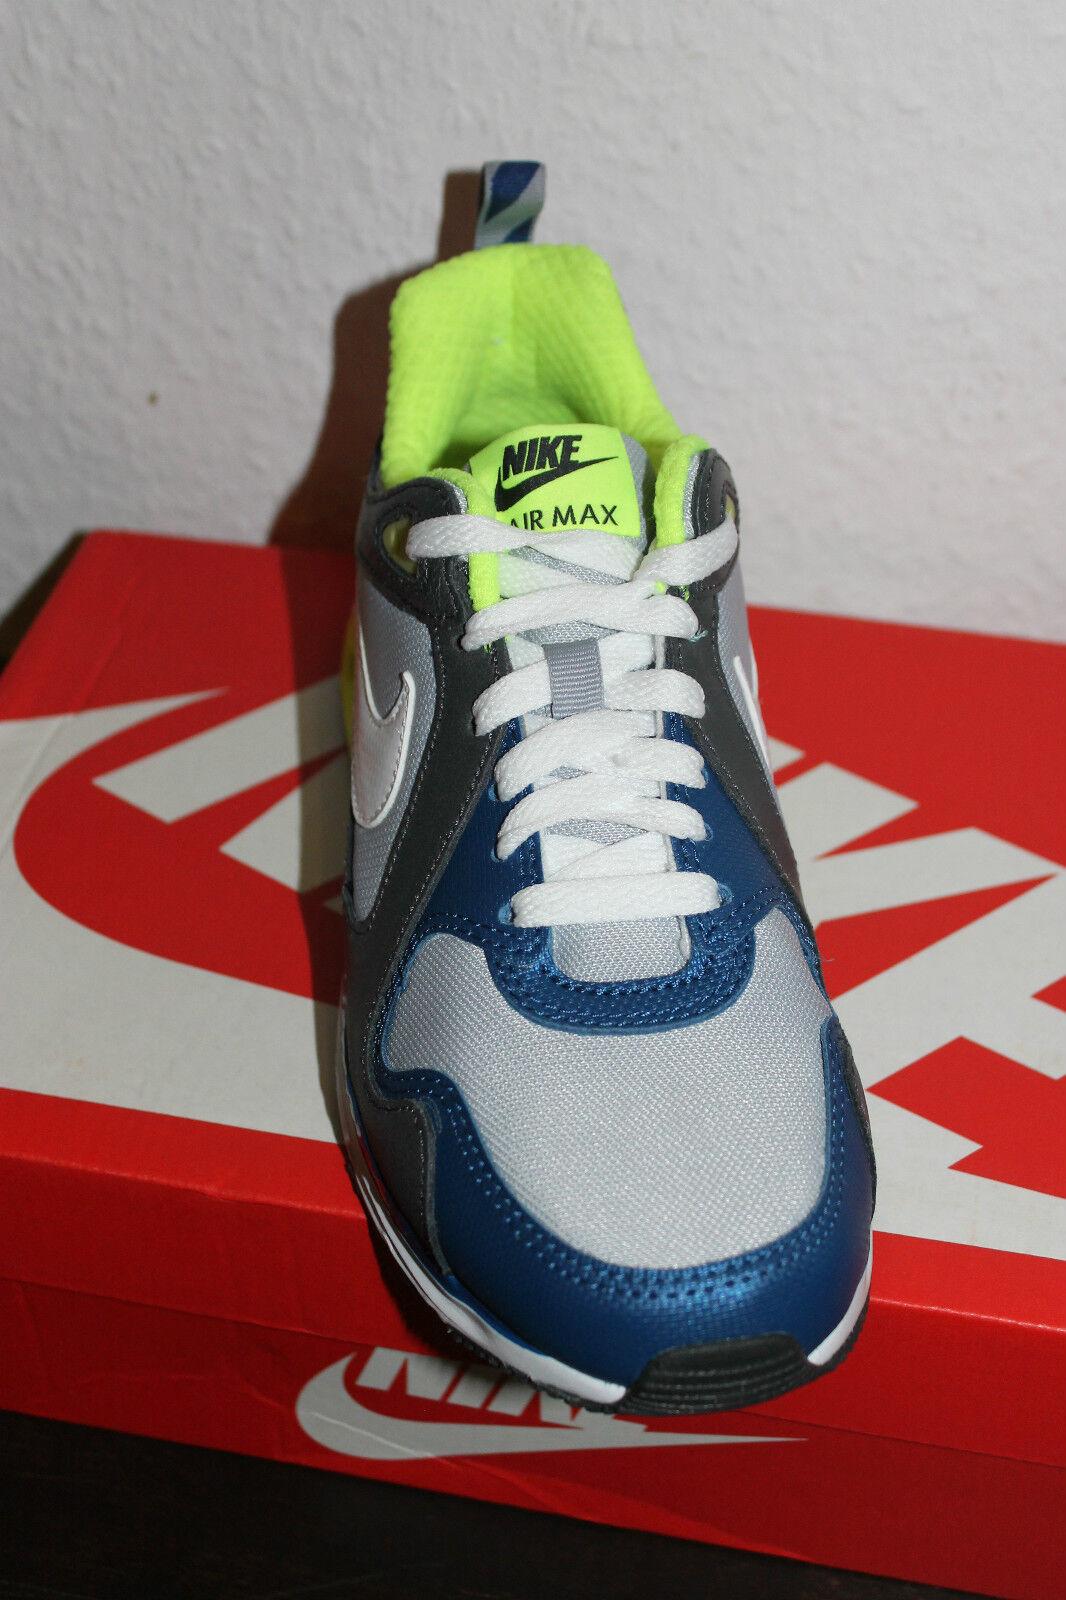 Nike Air Max Trax Damen Running Schuhe 36,5 Grau Weiß Blau Größe 36,5 Schuhe 38 oder 38,5 316bbe